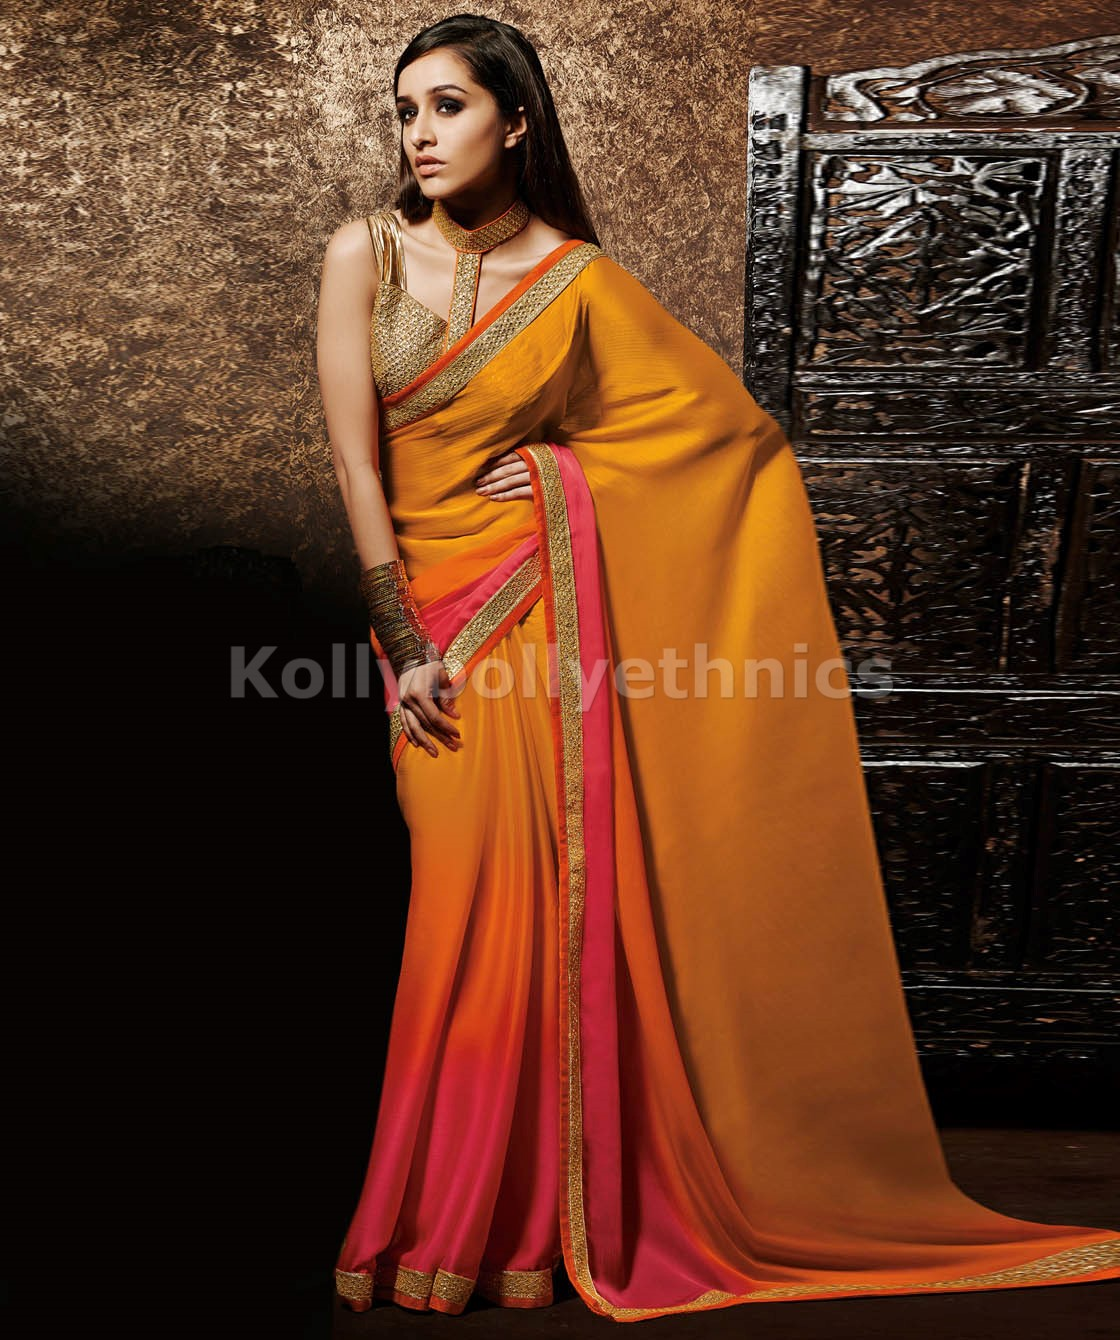 dc573f0996 Designer Saris online shopping in USA UK Canada|Buy shaded pink ...